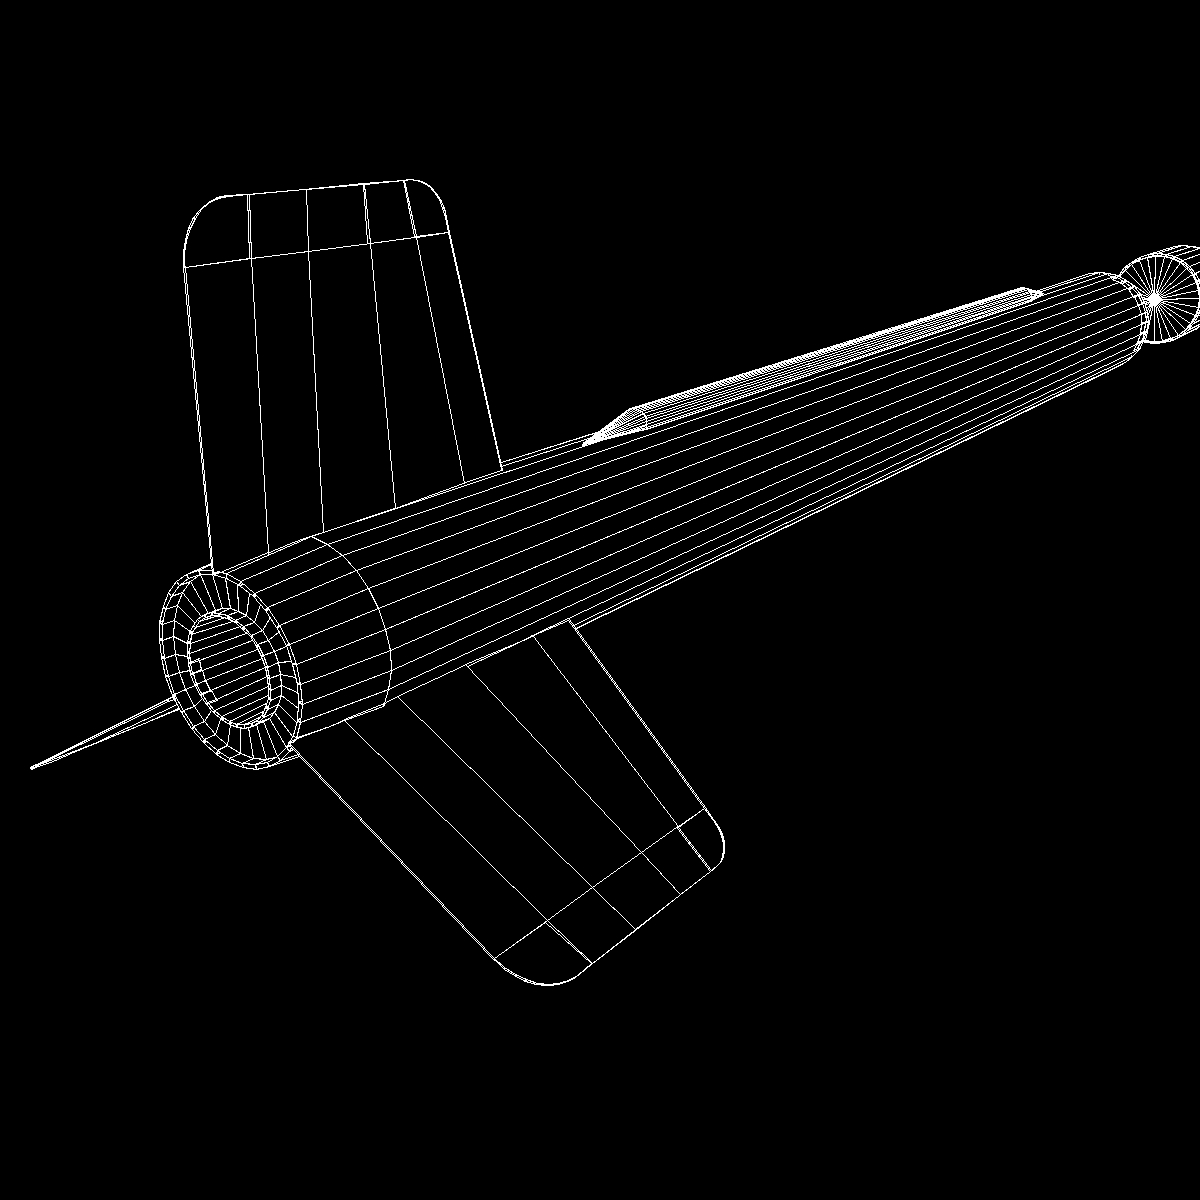 us wac corporal rocket 3d model 3ds dxf x cod scn obj 149629